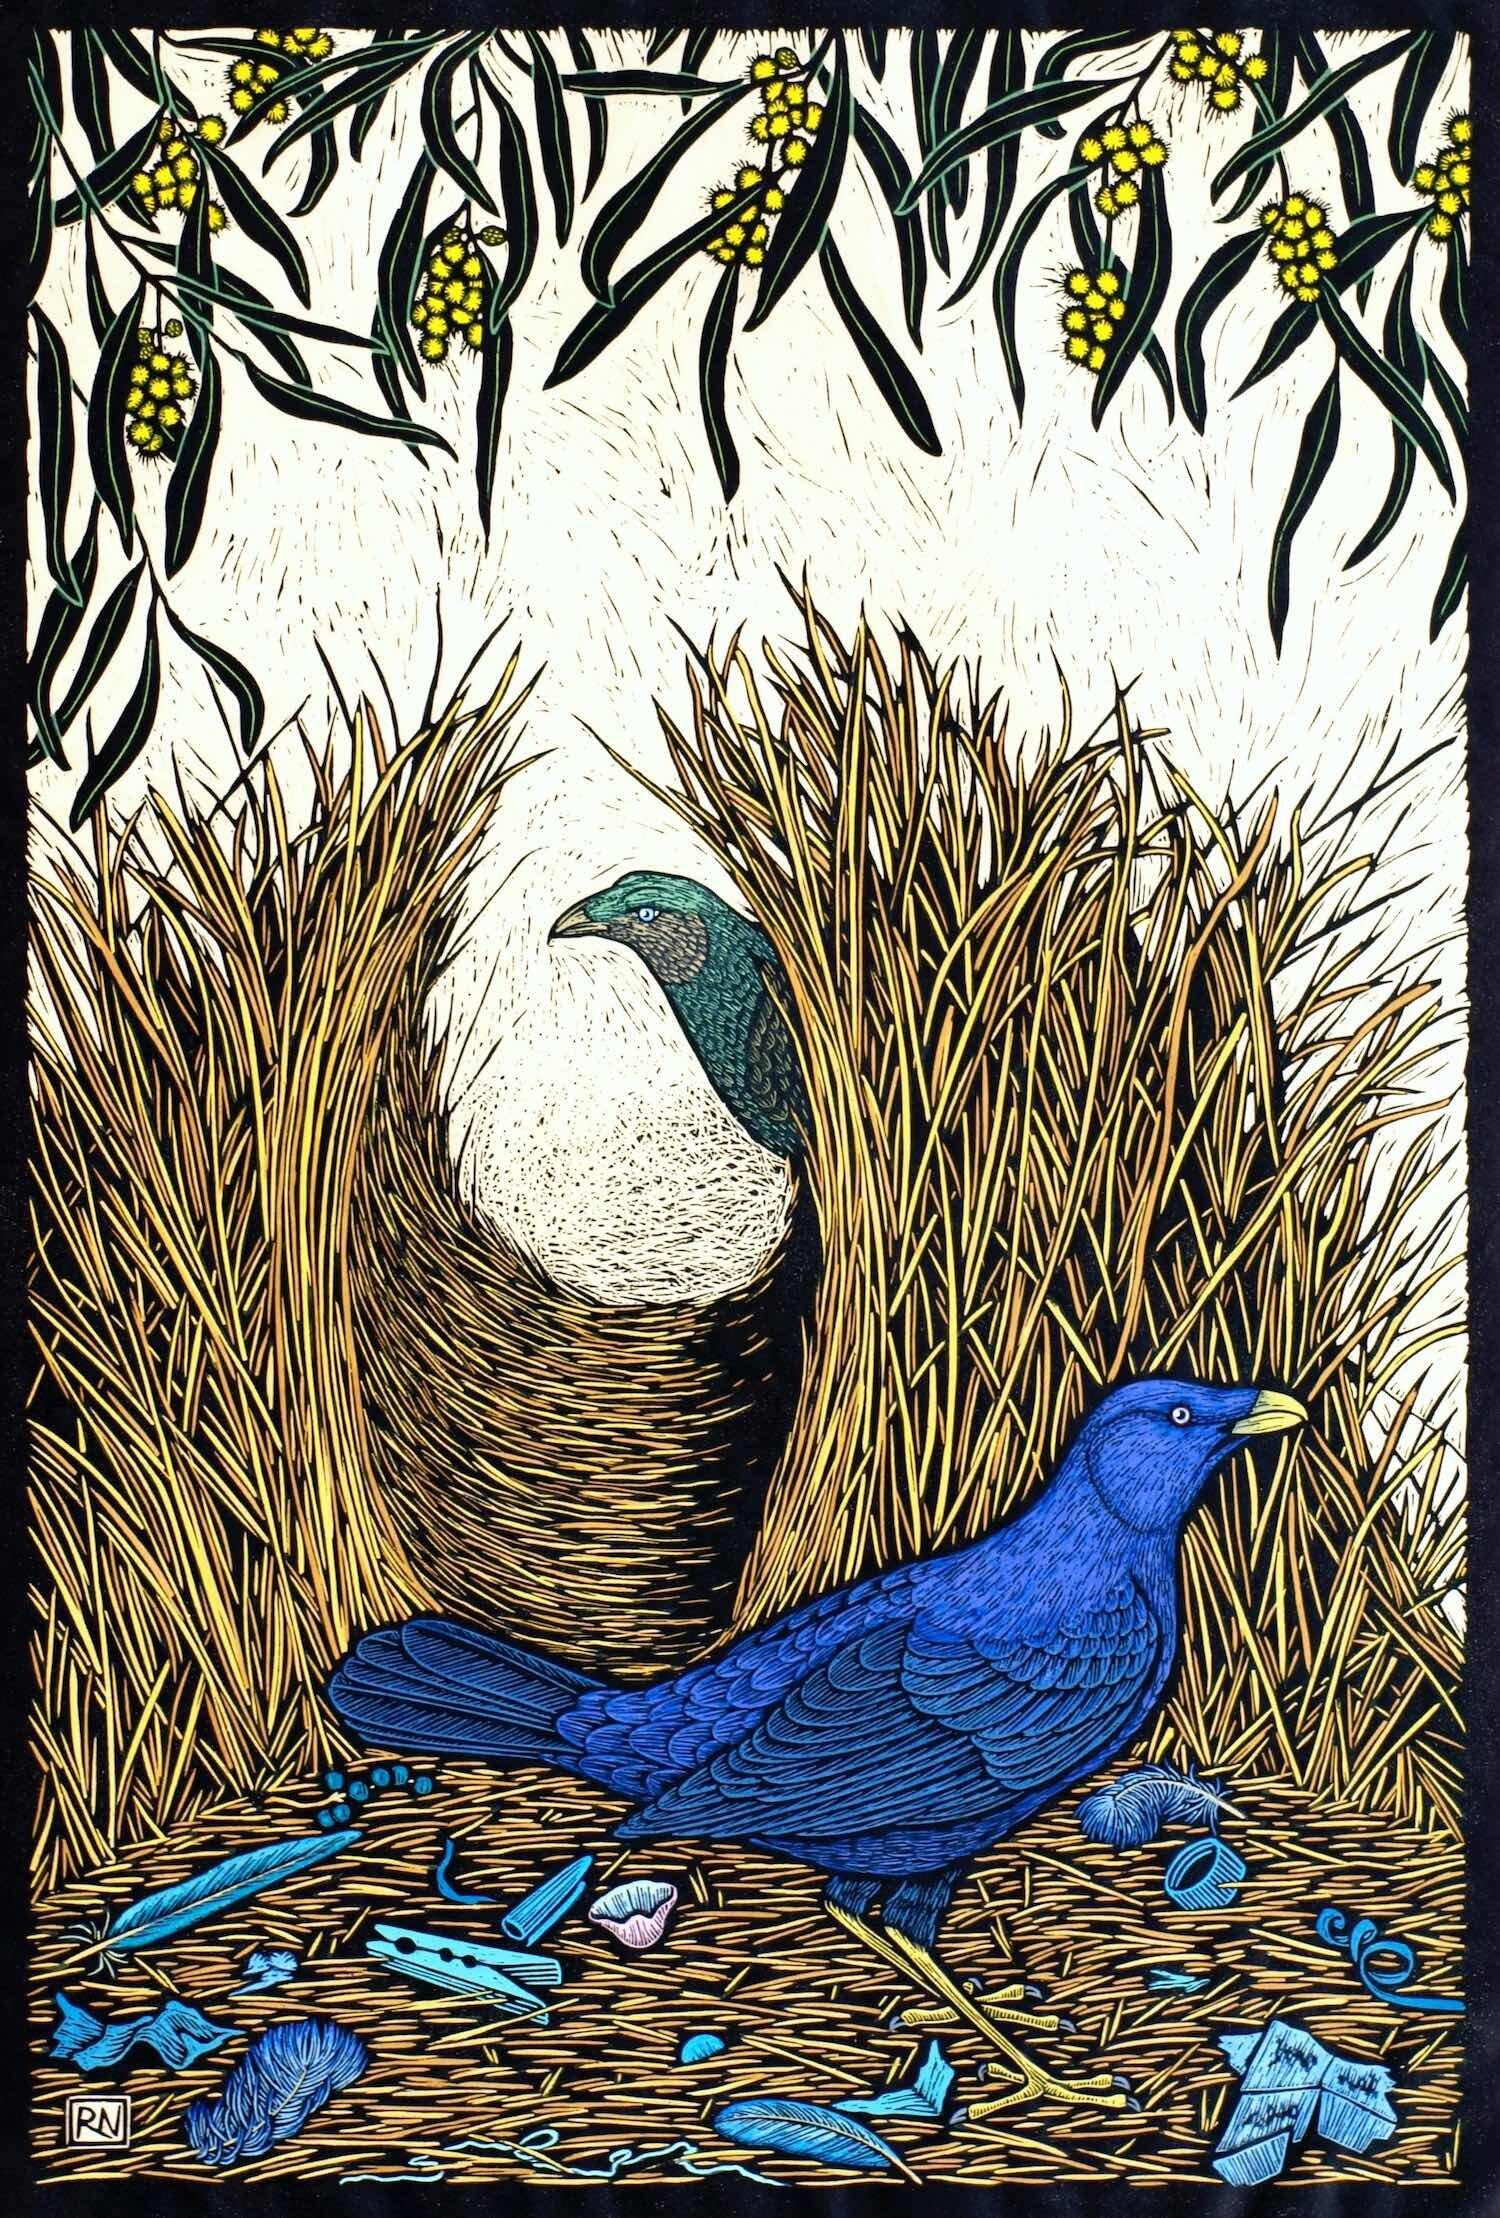 SATIN BOWERBIRD  74 X 50 CM, EDITION OF 50  HAND-COLOURED LINOCUT ON HANDMADE JAPANESE PAPER  $1,700